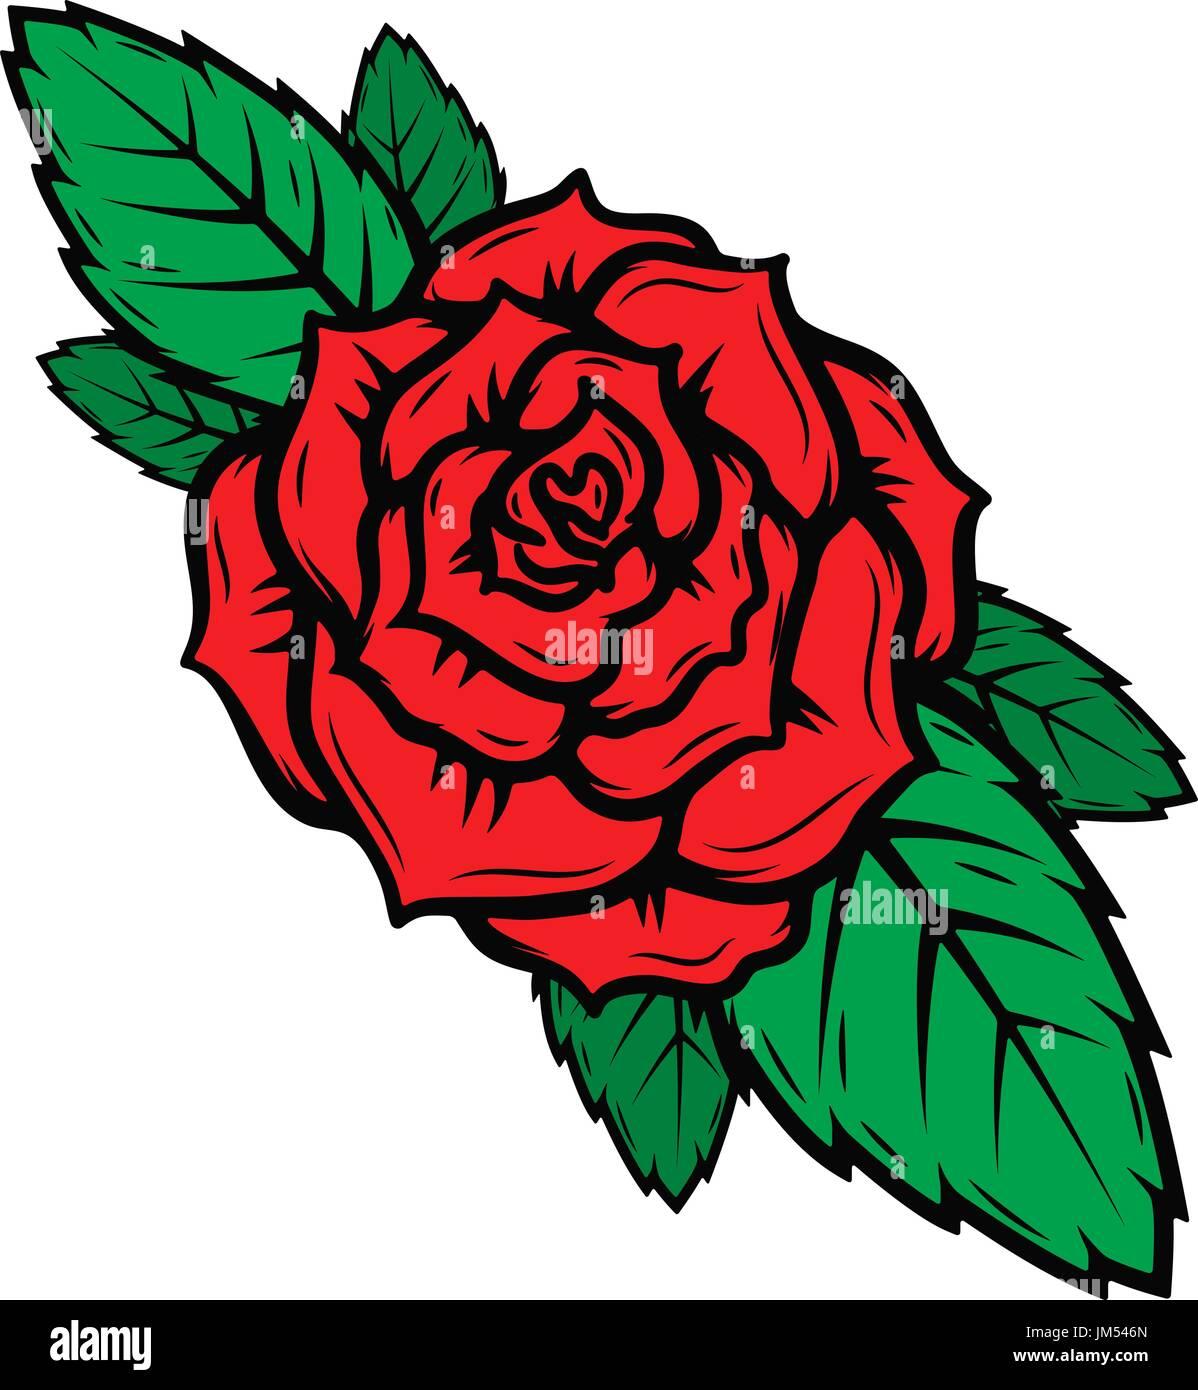 Old rose school designs photo